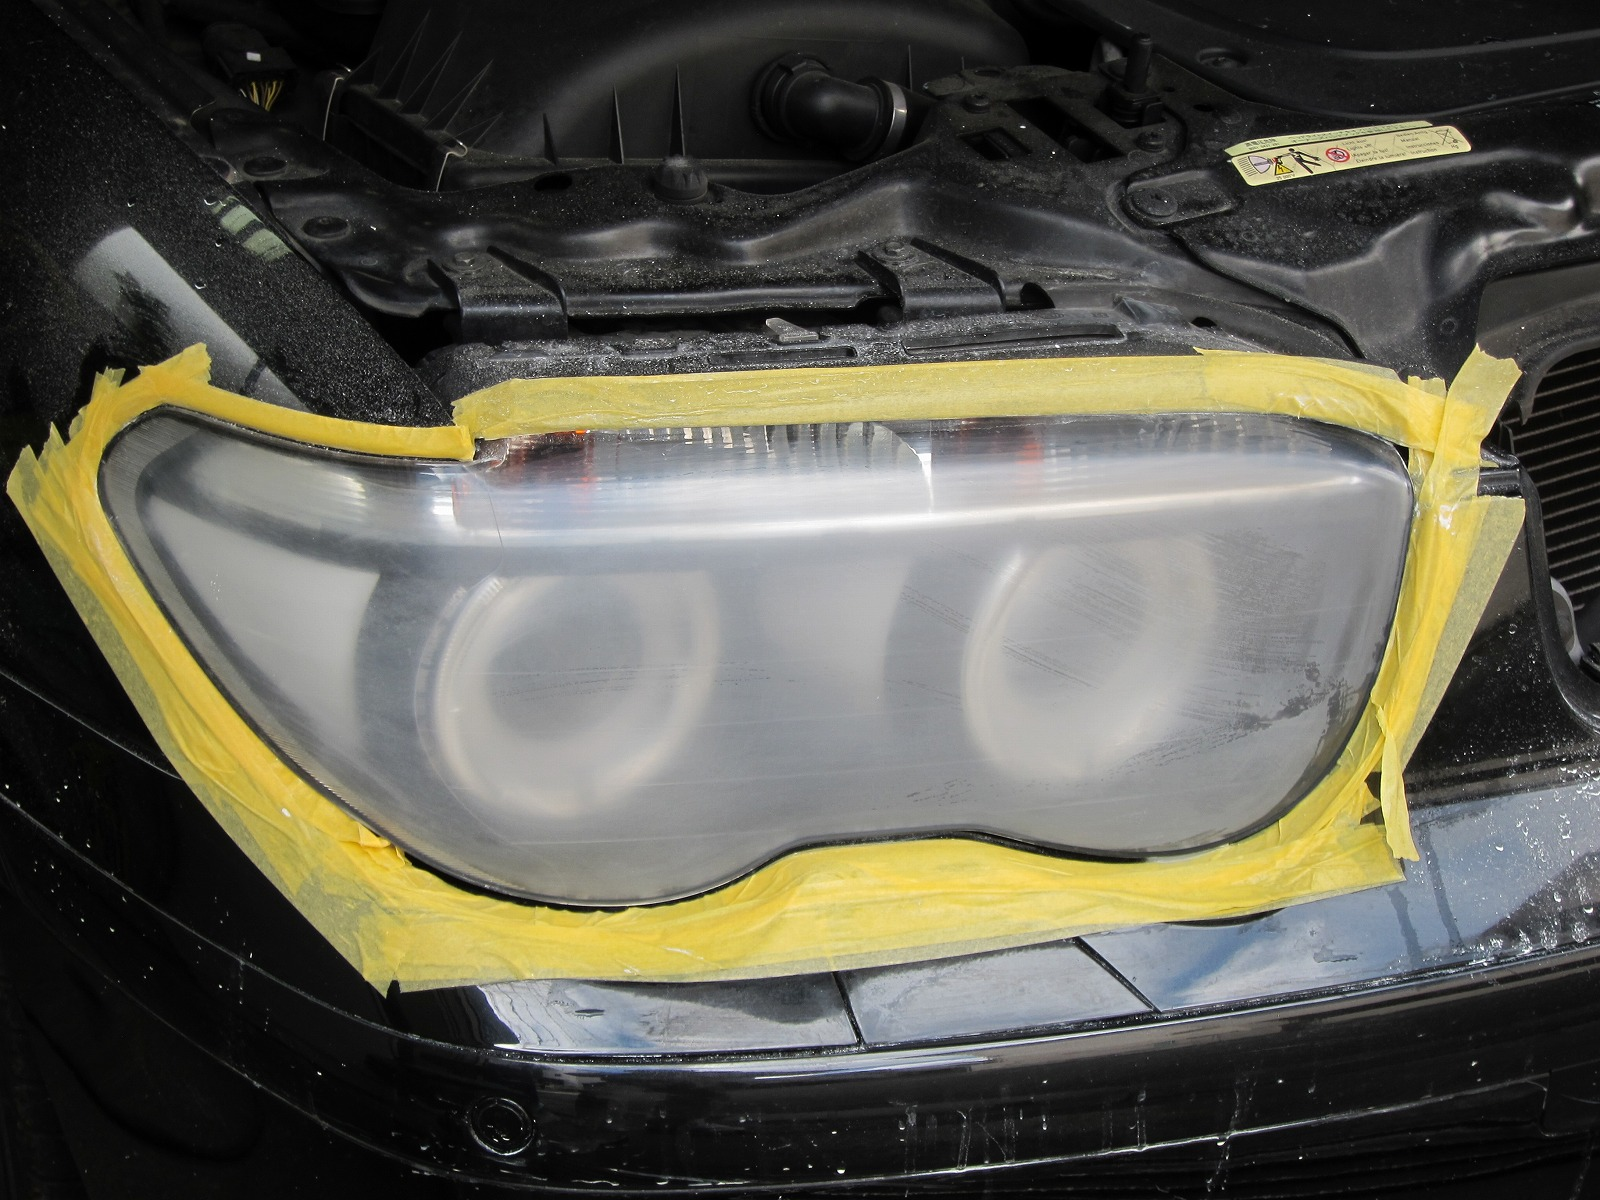 20160518bmw-745i-headlight-cleaning-07